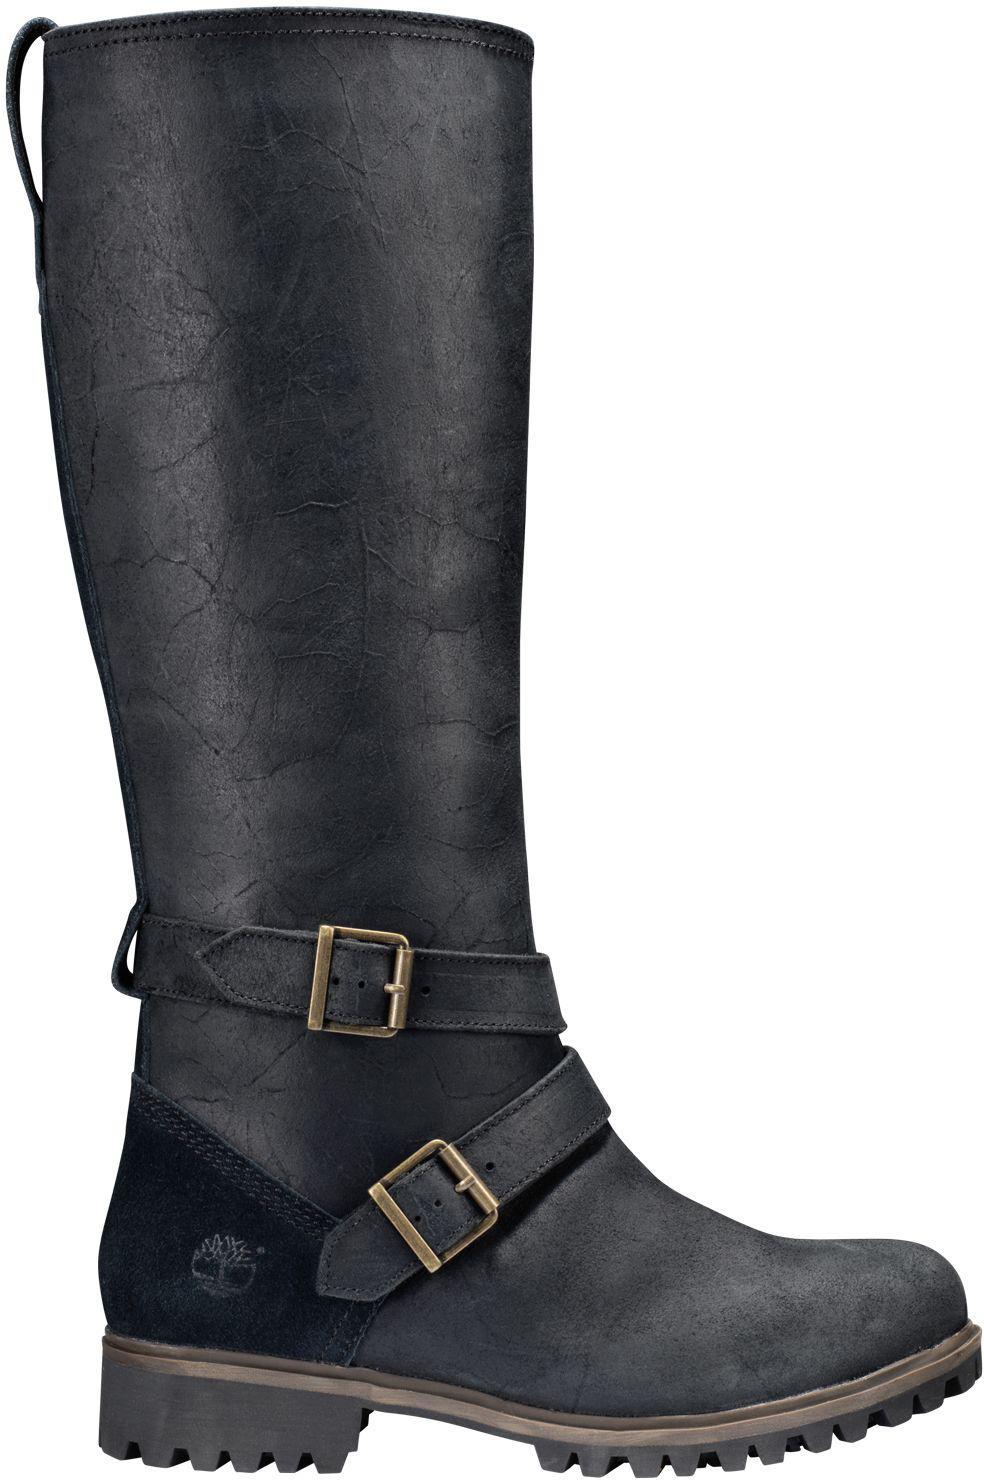 9f6b73e1afc Timberland Black Wheelwright Tall Waterproof Casual Boots